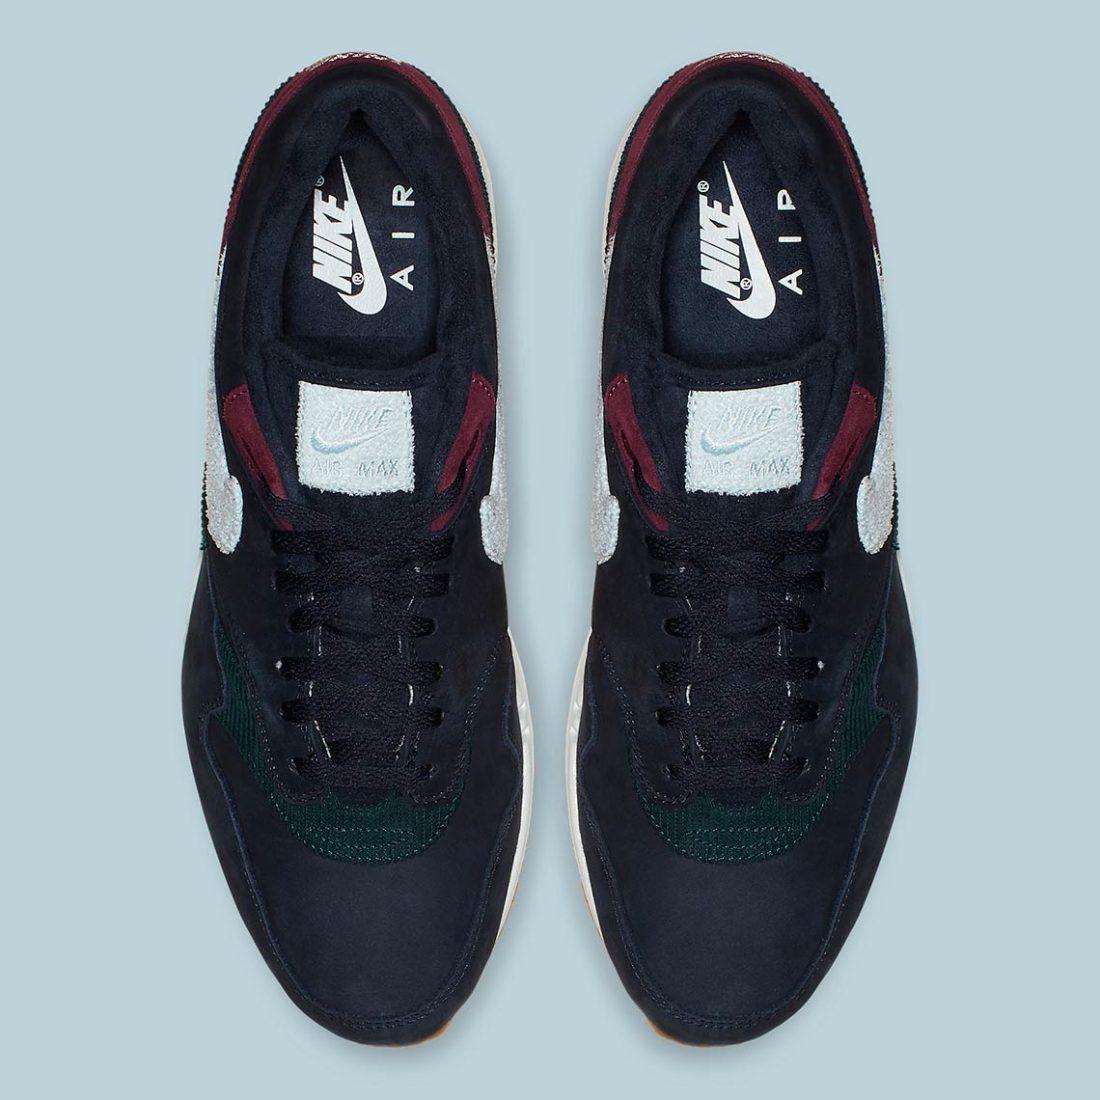 Nike Air Max 1 Premium Crepe Sole Dark Obsidian Cd7861 400